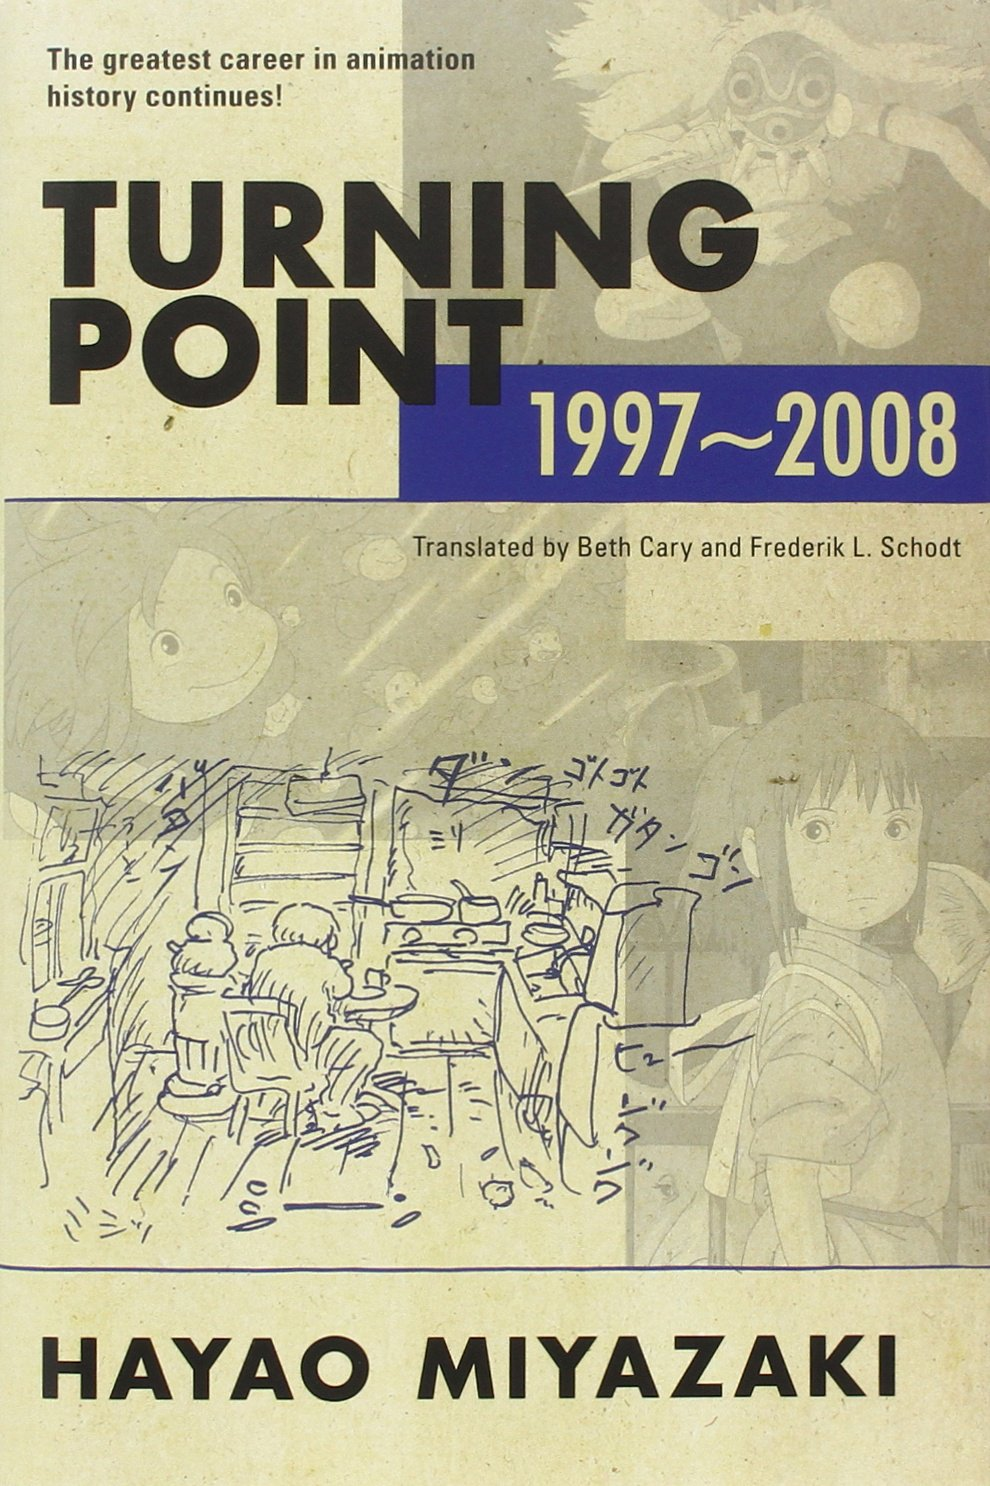 05_Turning Point, 1997-2008